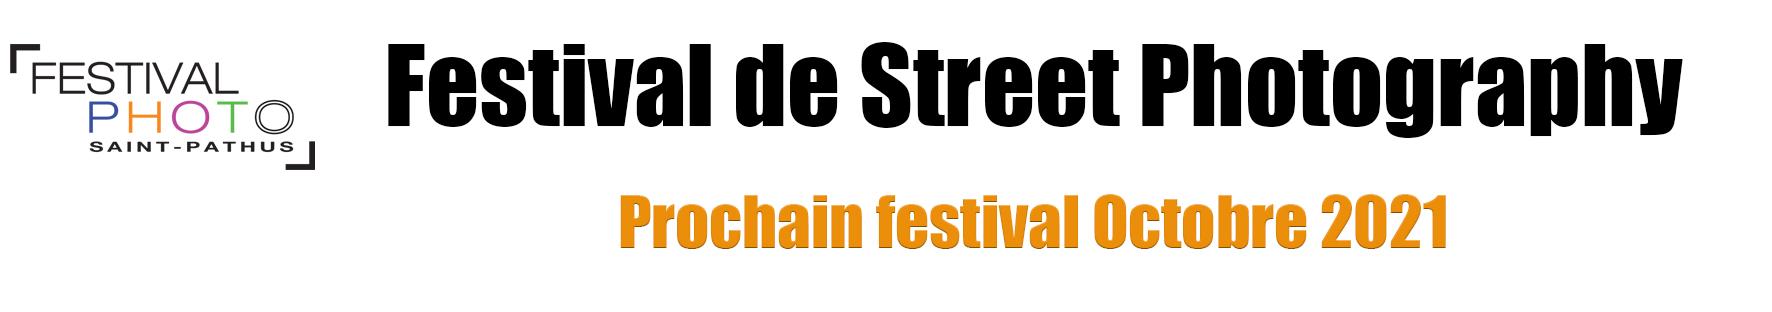 Festival de Street Photography